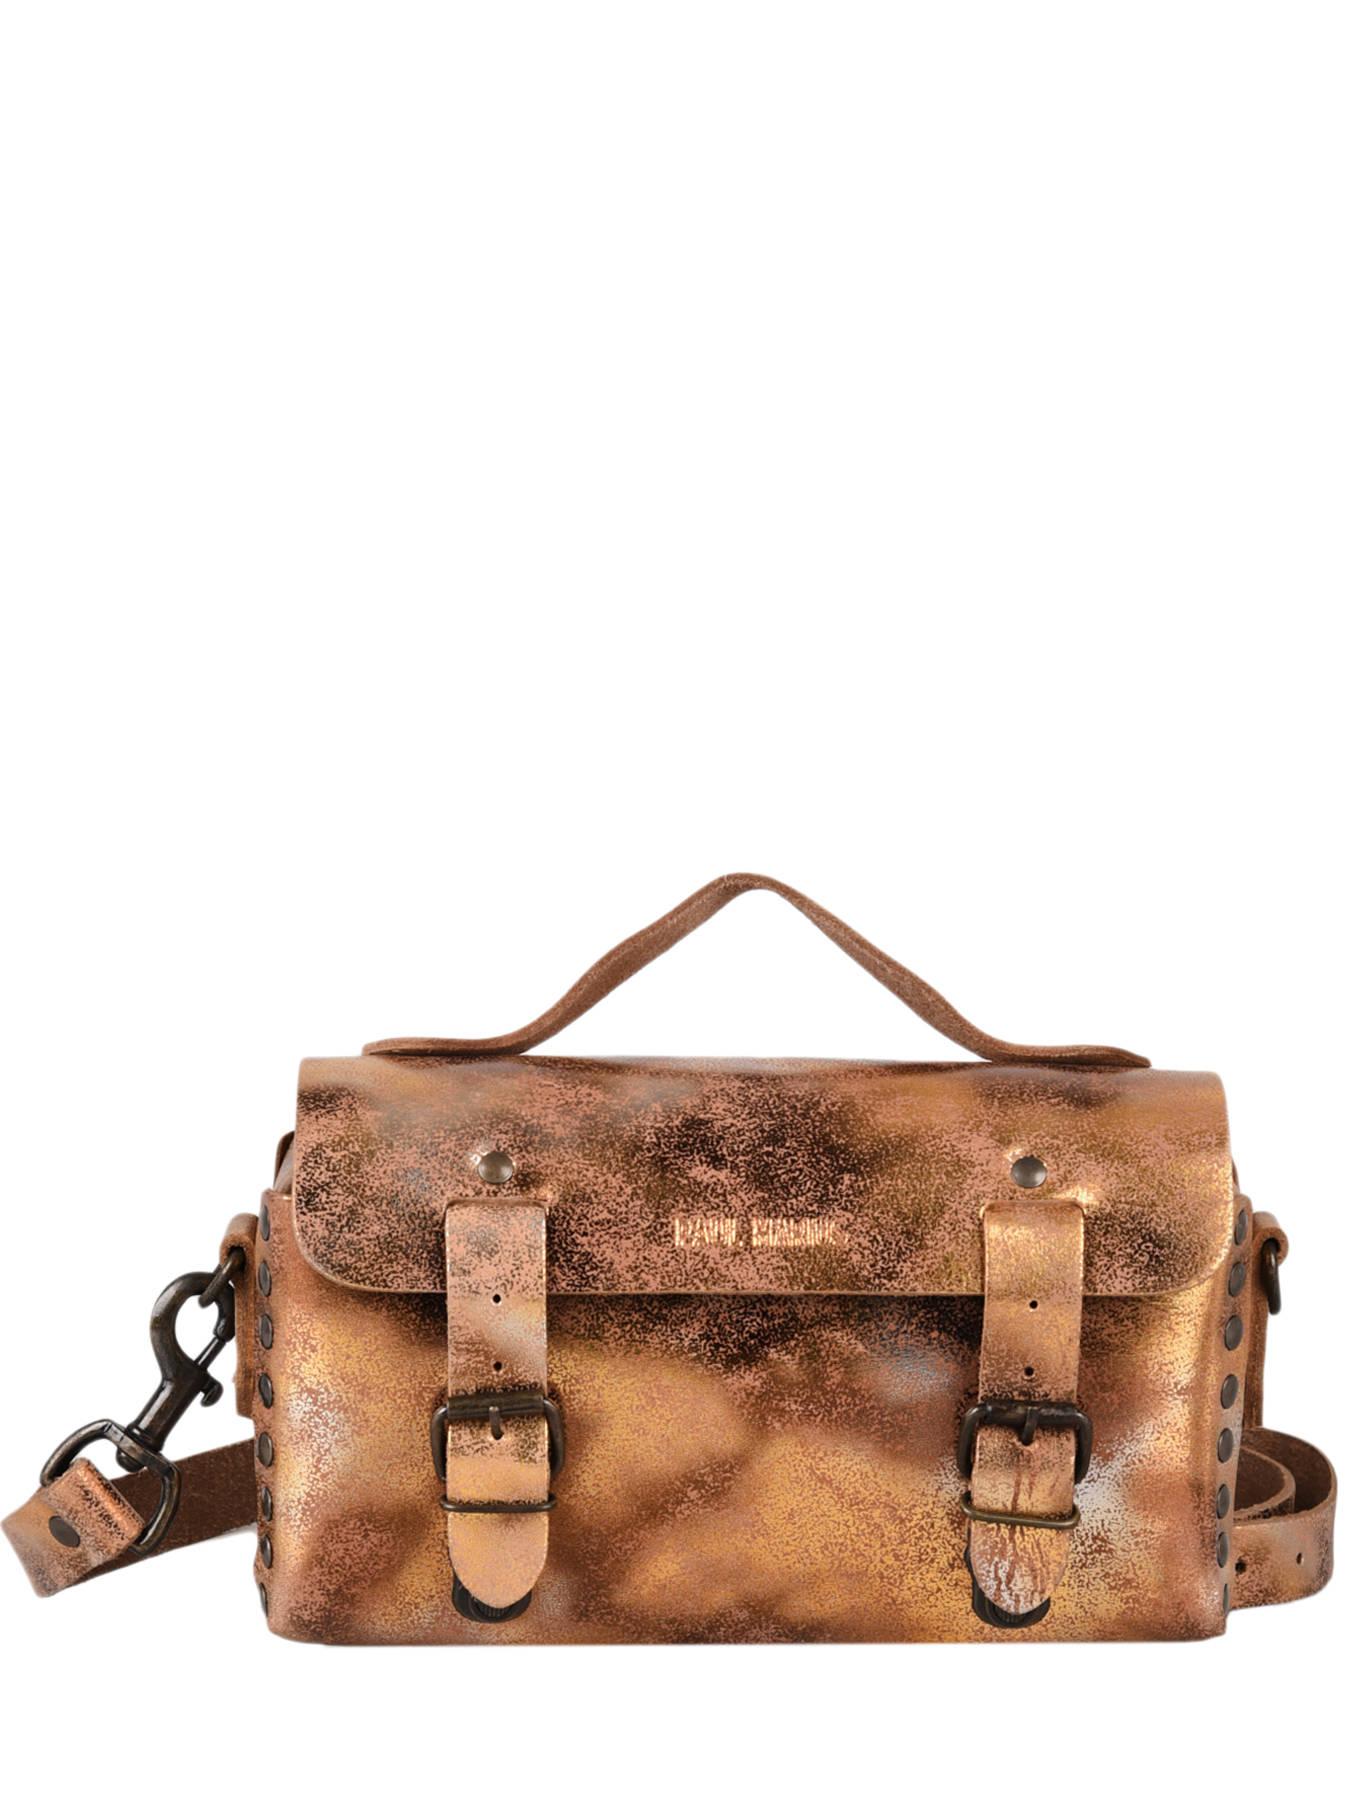 Sac bandoulière Vintage cuir PAUL MARIUS